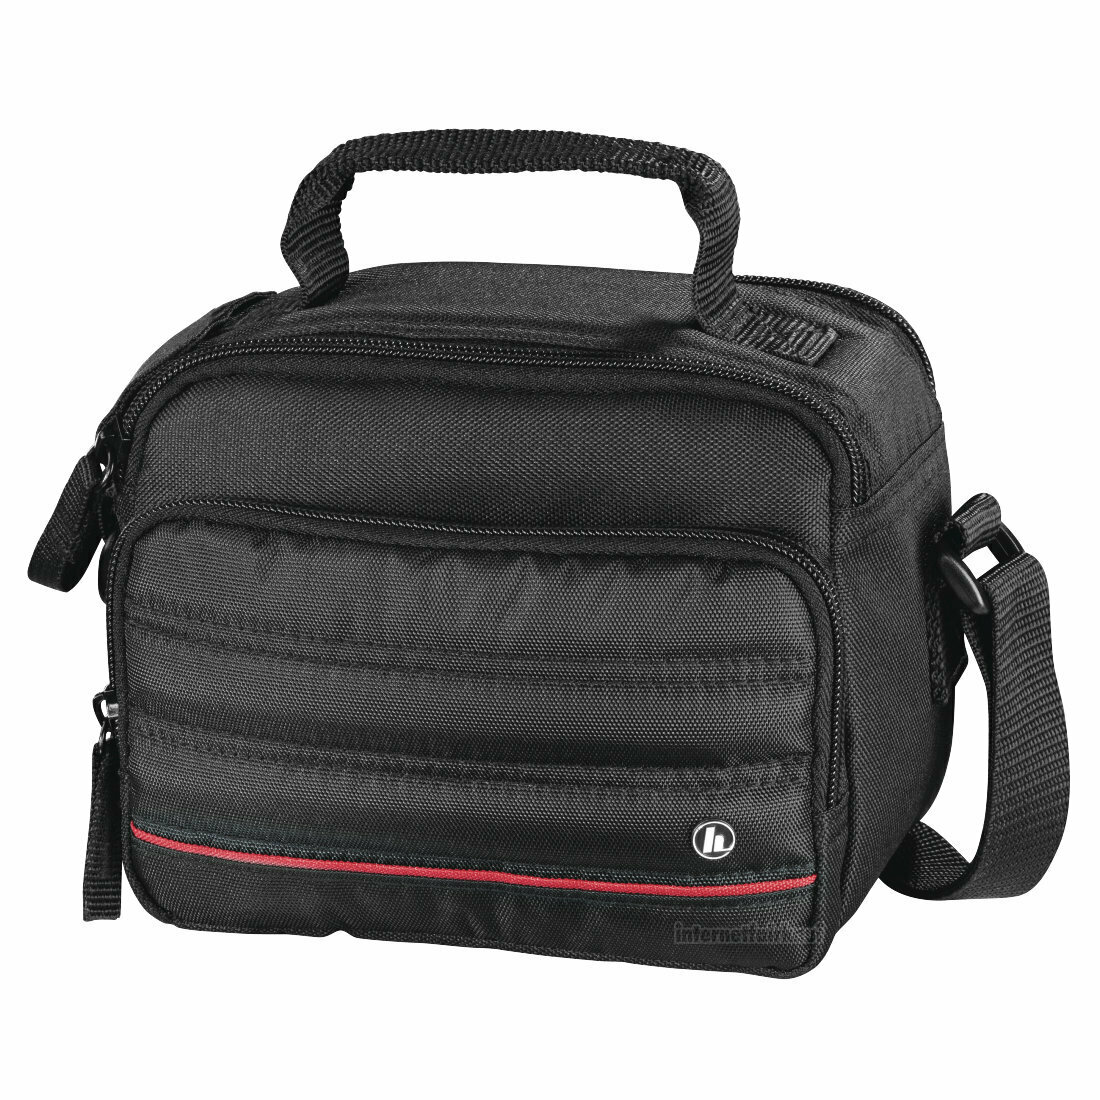 Tasche passend für Panasonic HDC-SD800 HDC-SD909 HDC-HS900 HDC-TM900